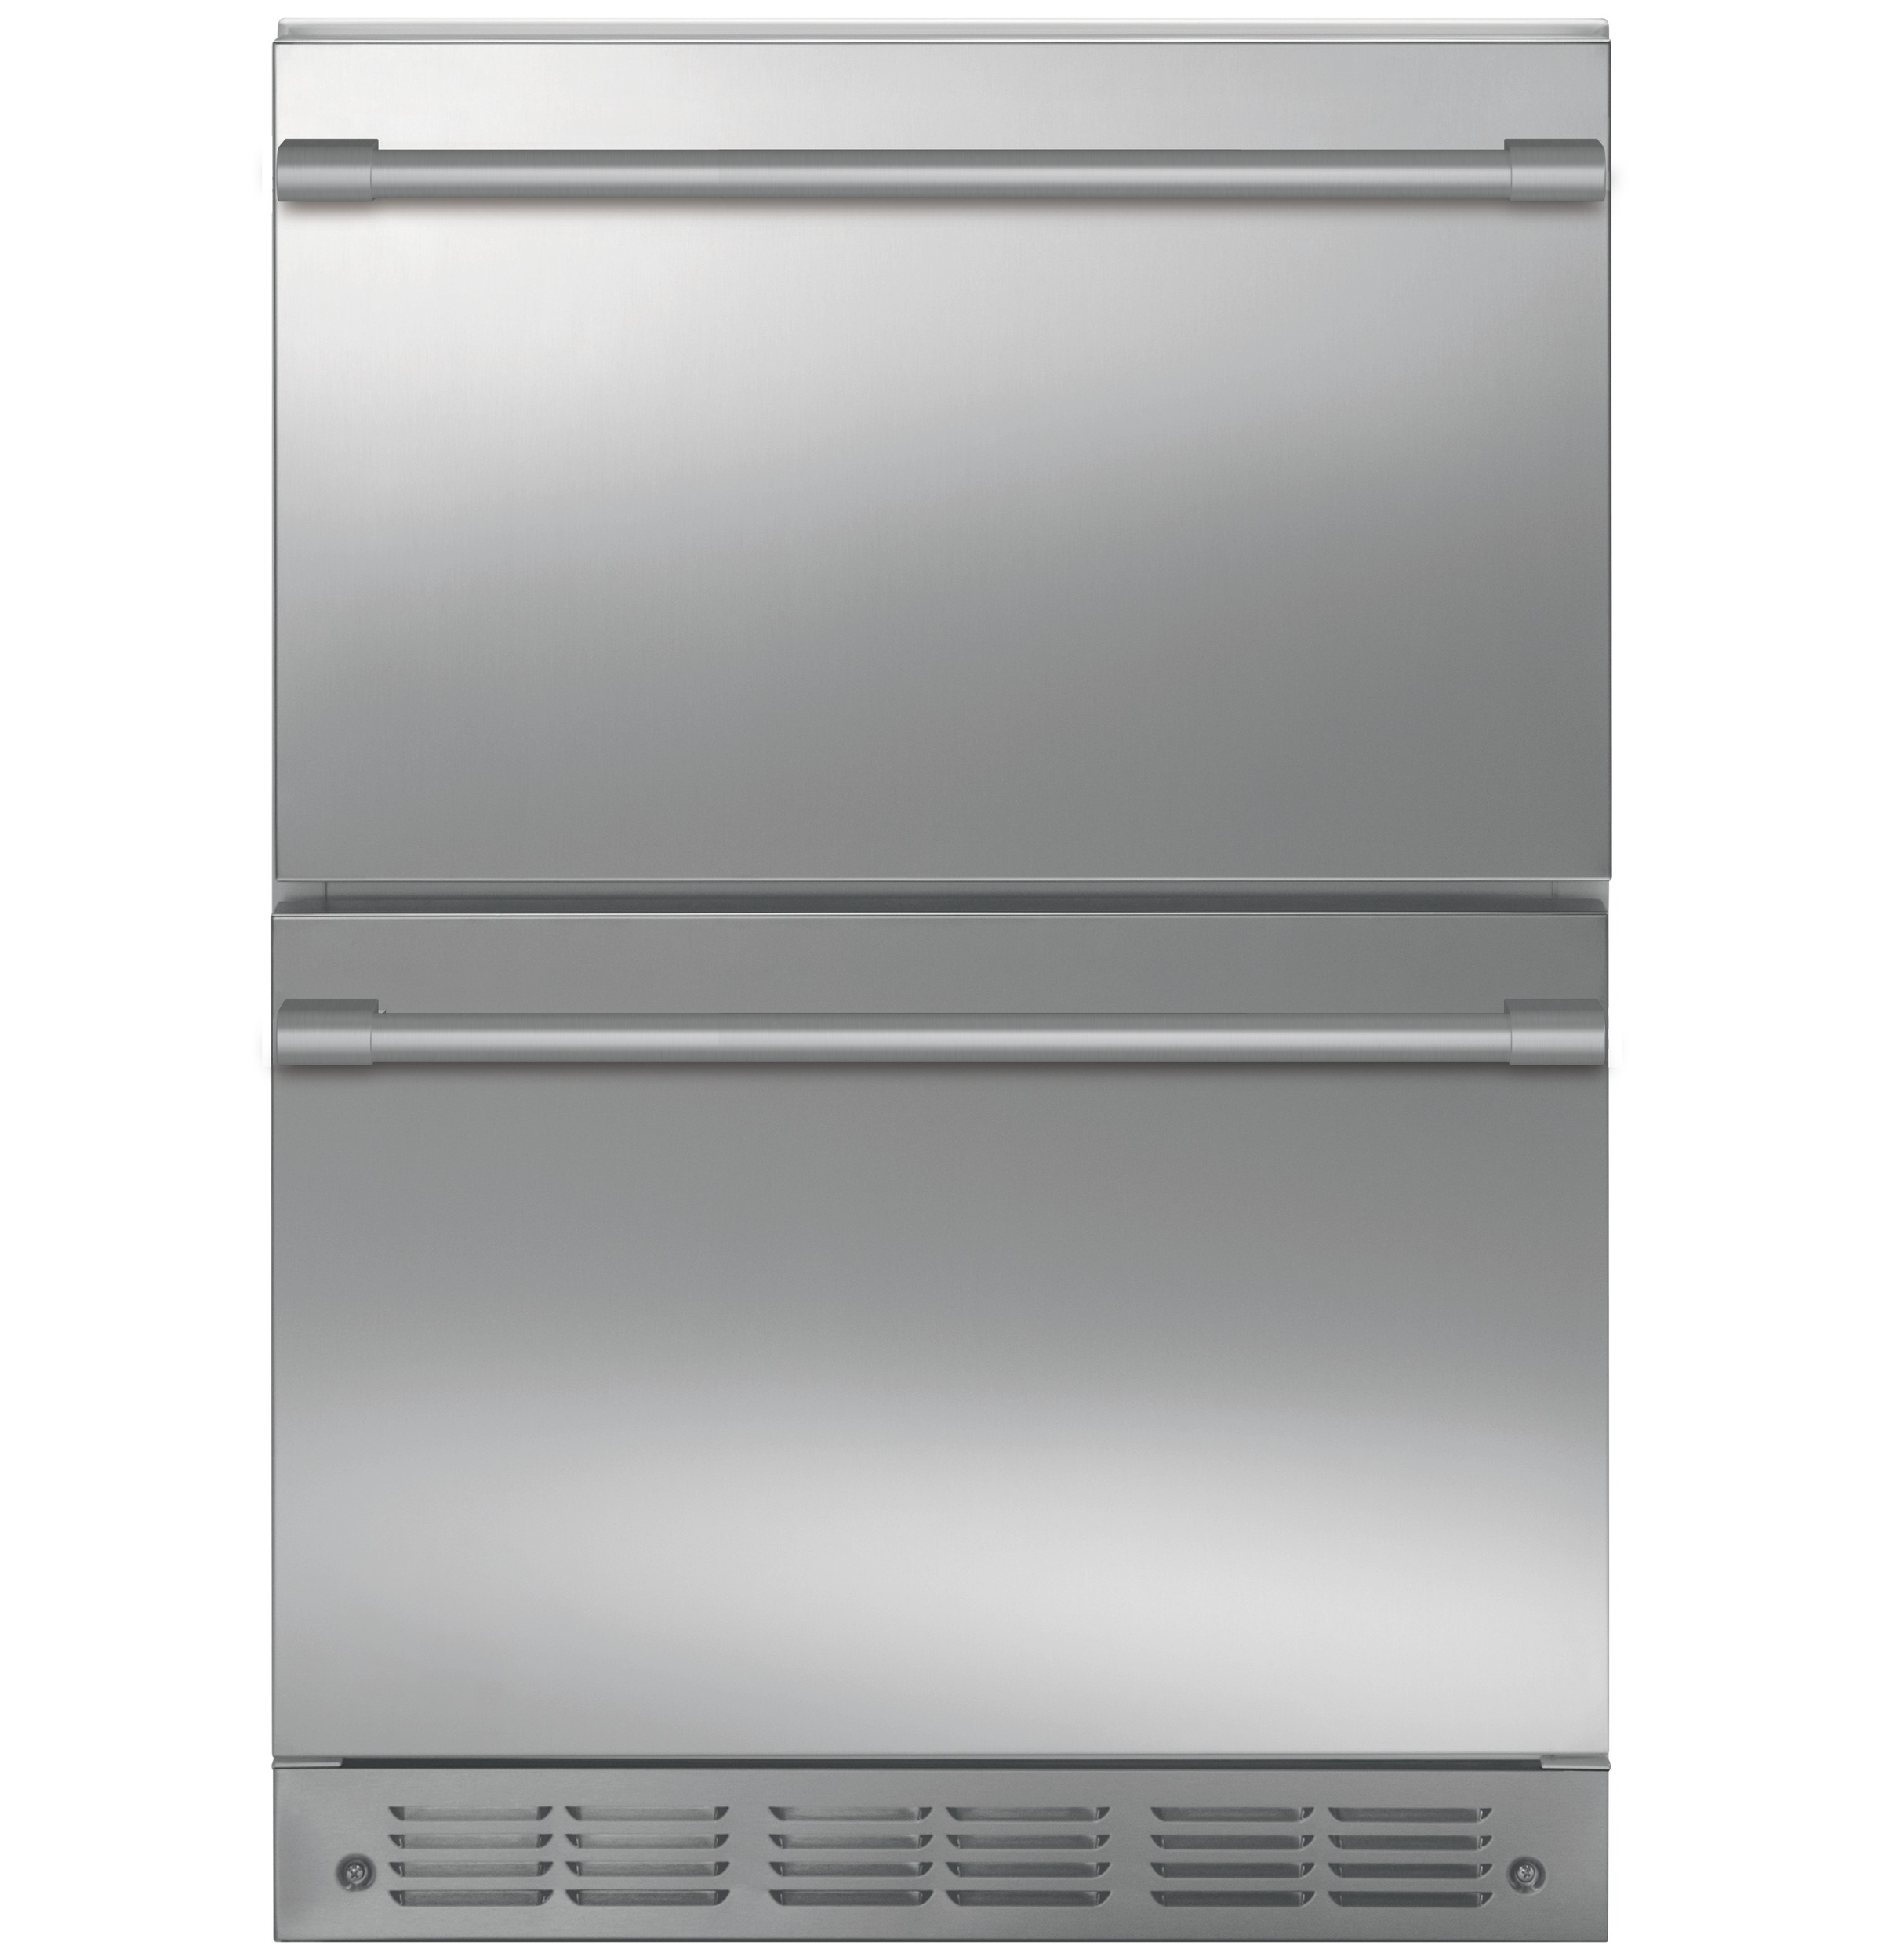 Monogram Monogram Double-Drawer Refrigerator